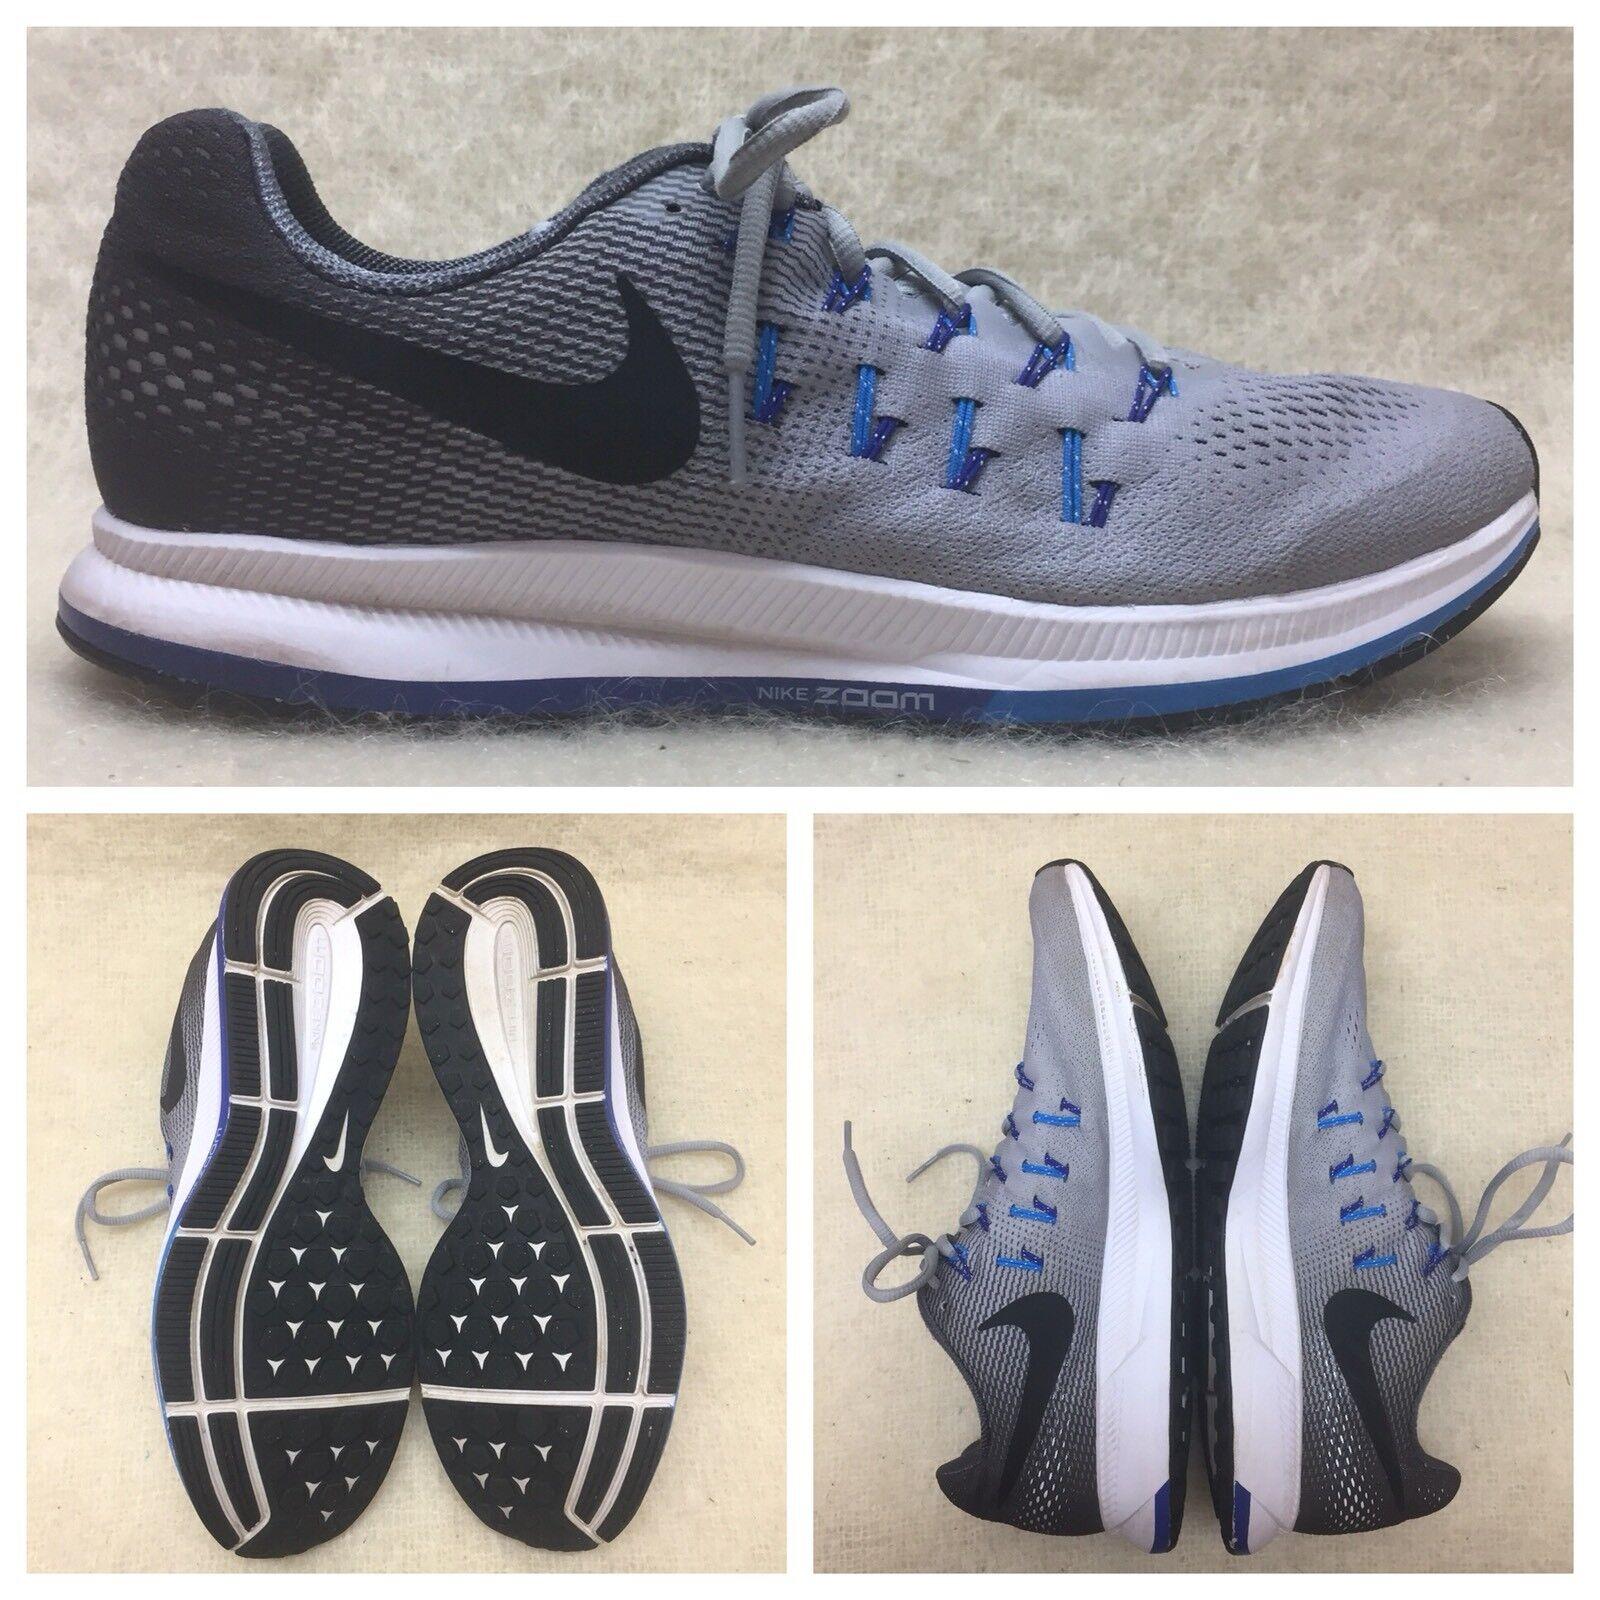 NIKE Zoom Pegasus 33 Running Exercise Shoes 831352-004 Men's Size 11.5